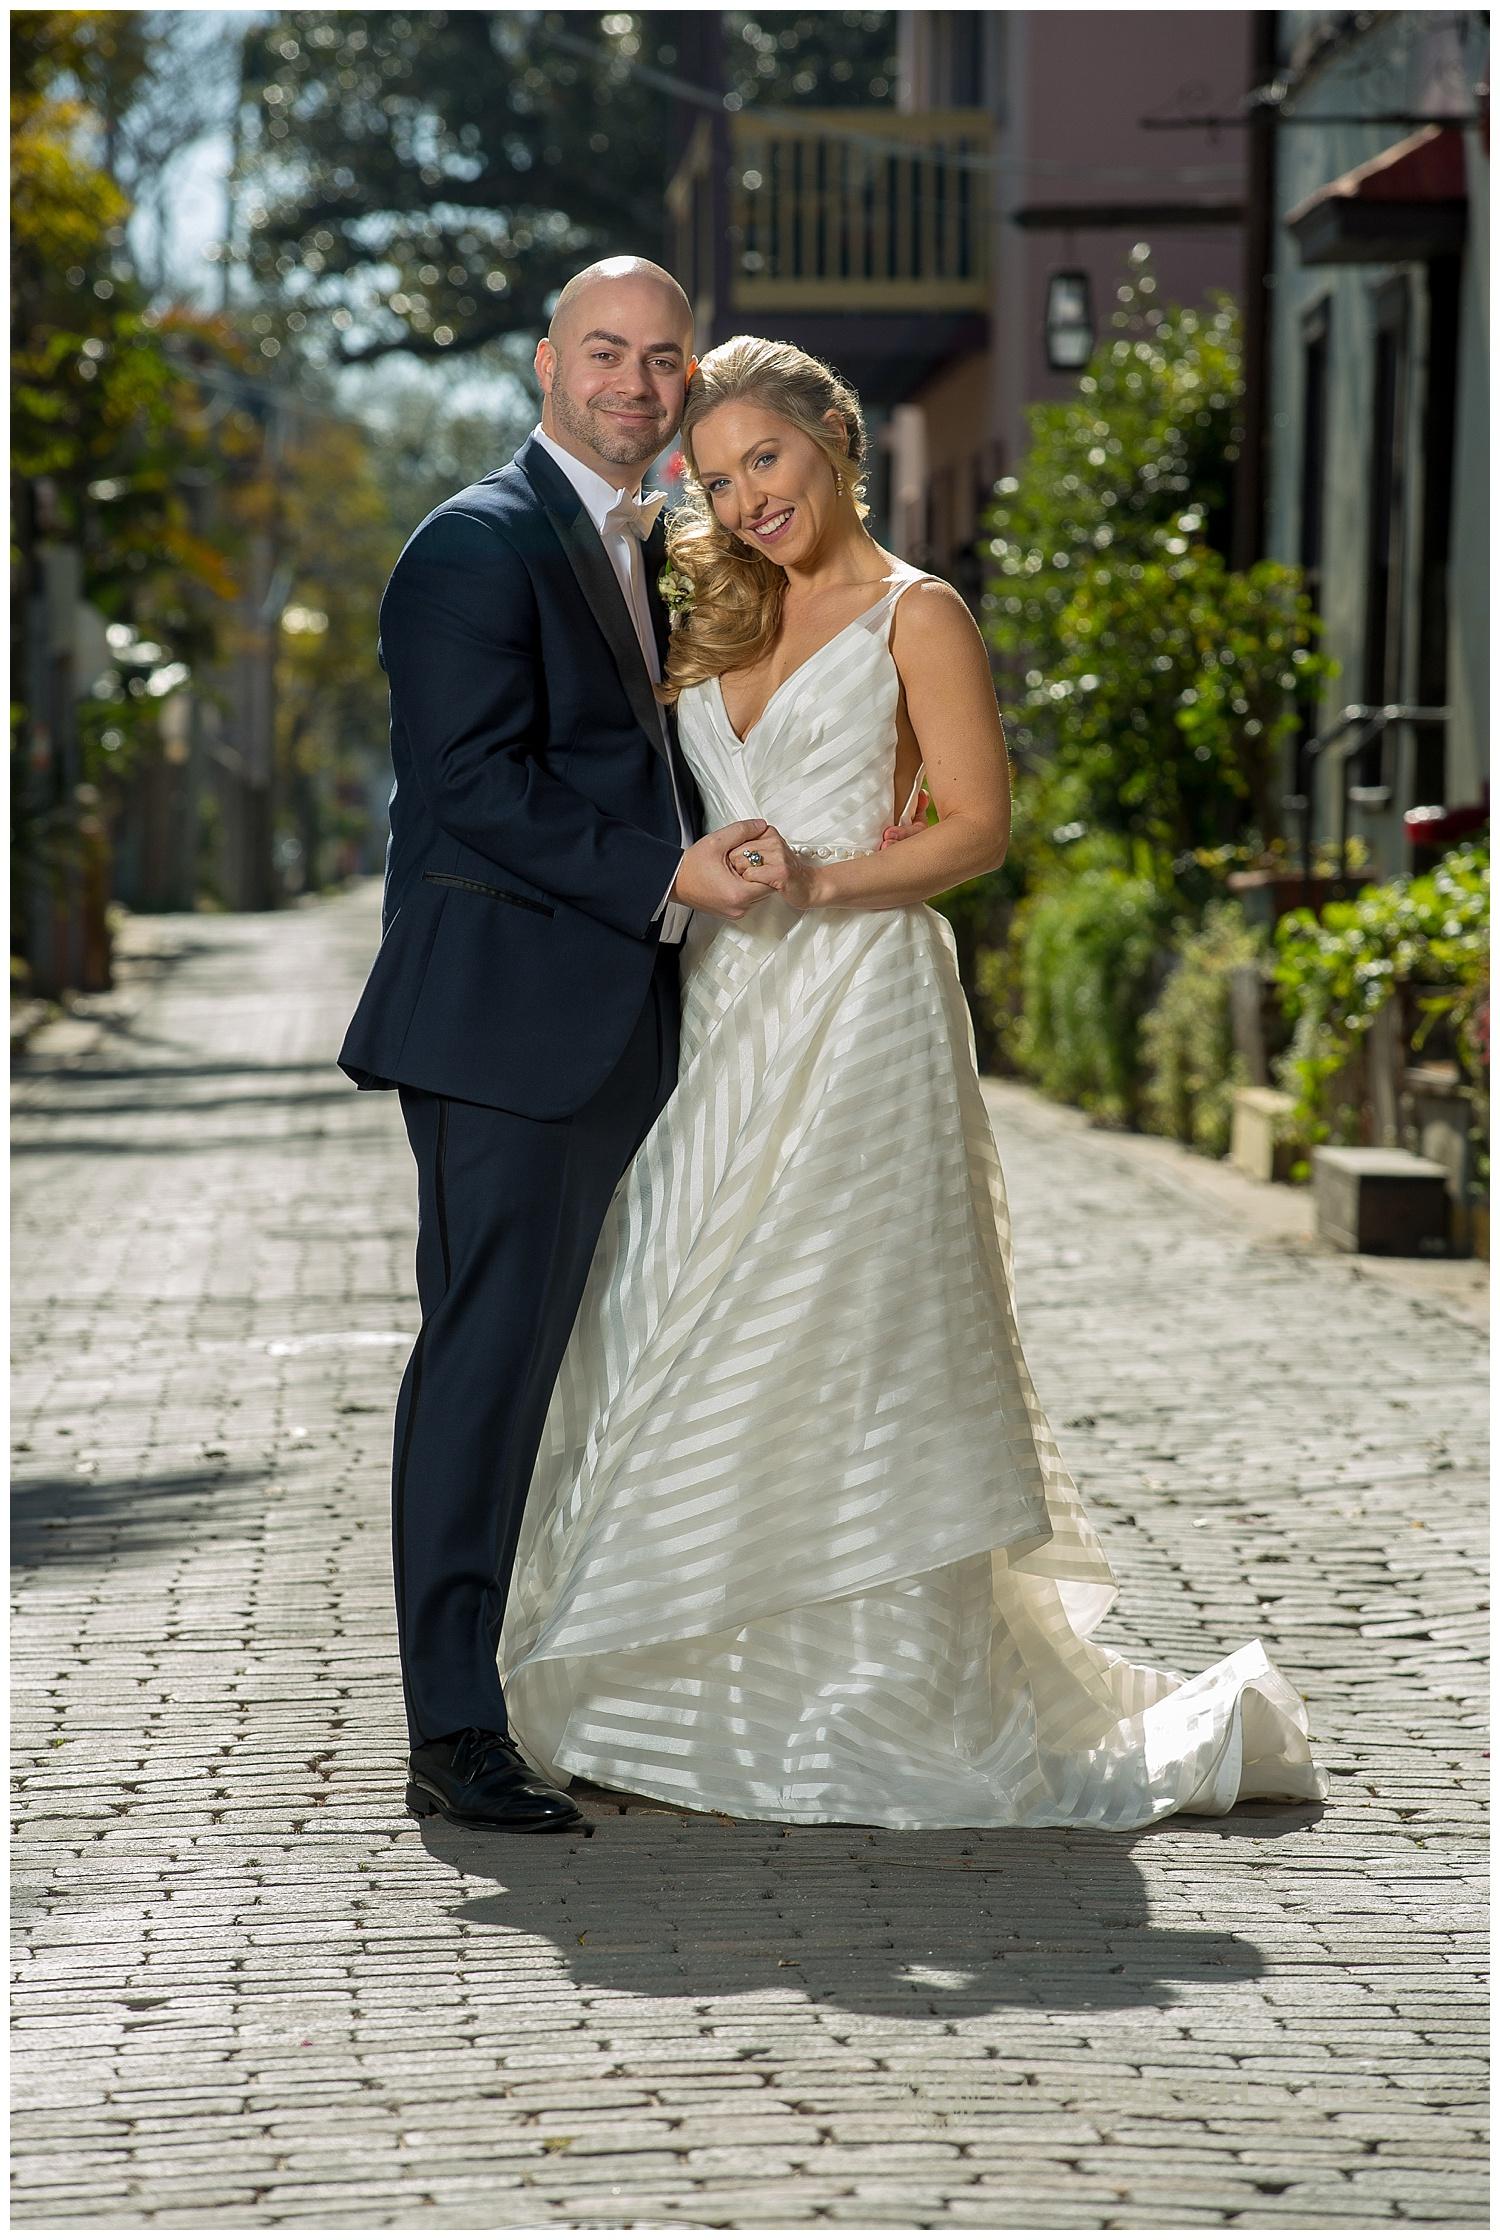 Villa Blanca Wedding Photographer -047.JPG